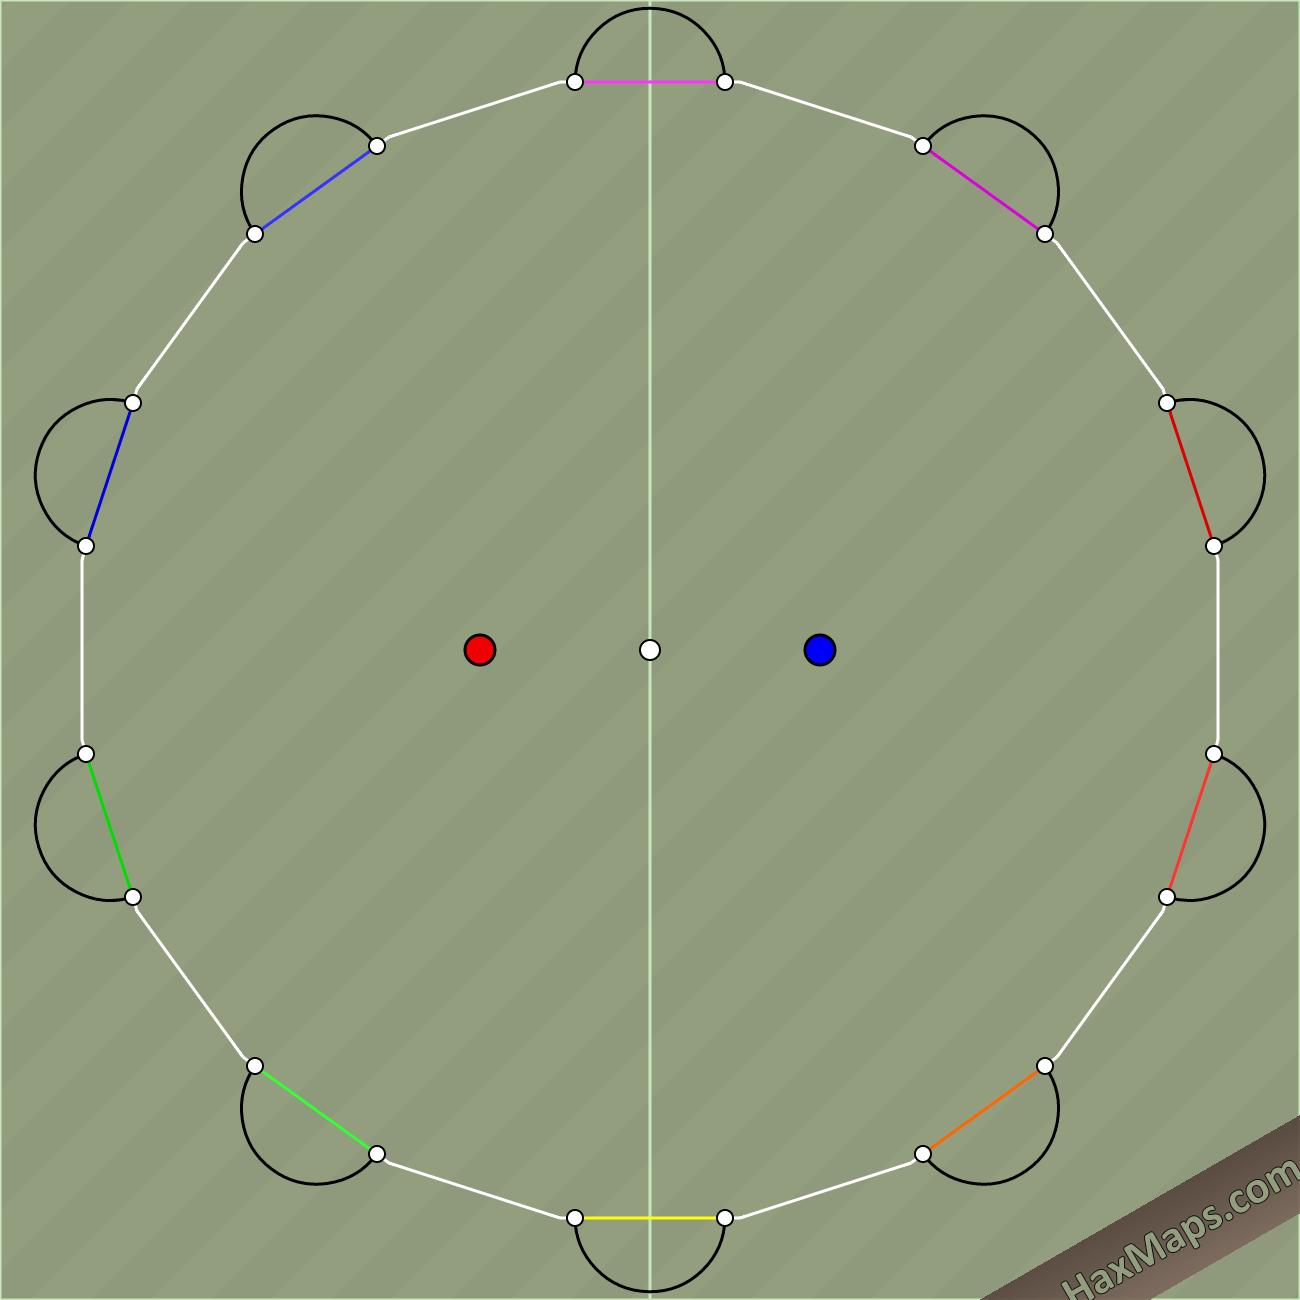 hax ball maps | v10 Power Japon by Jeysin